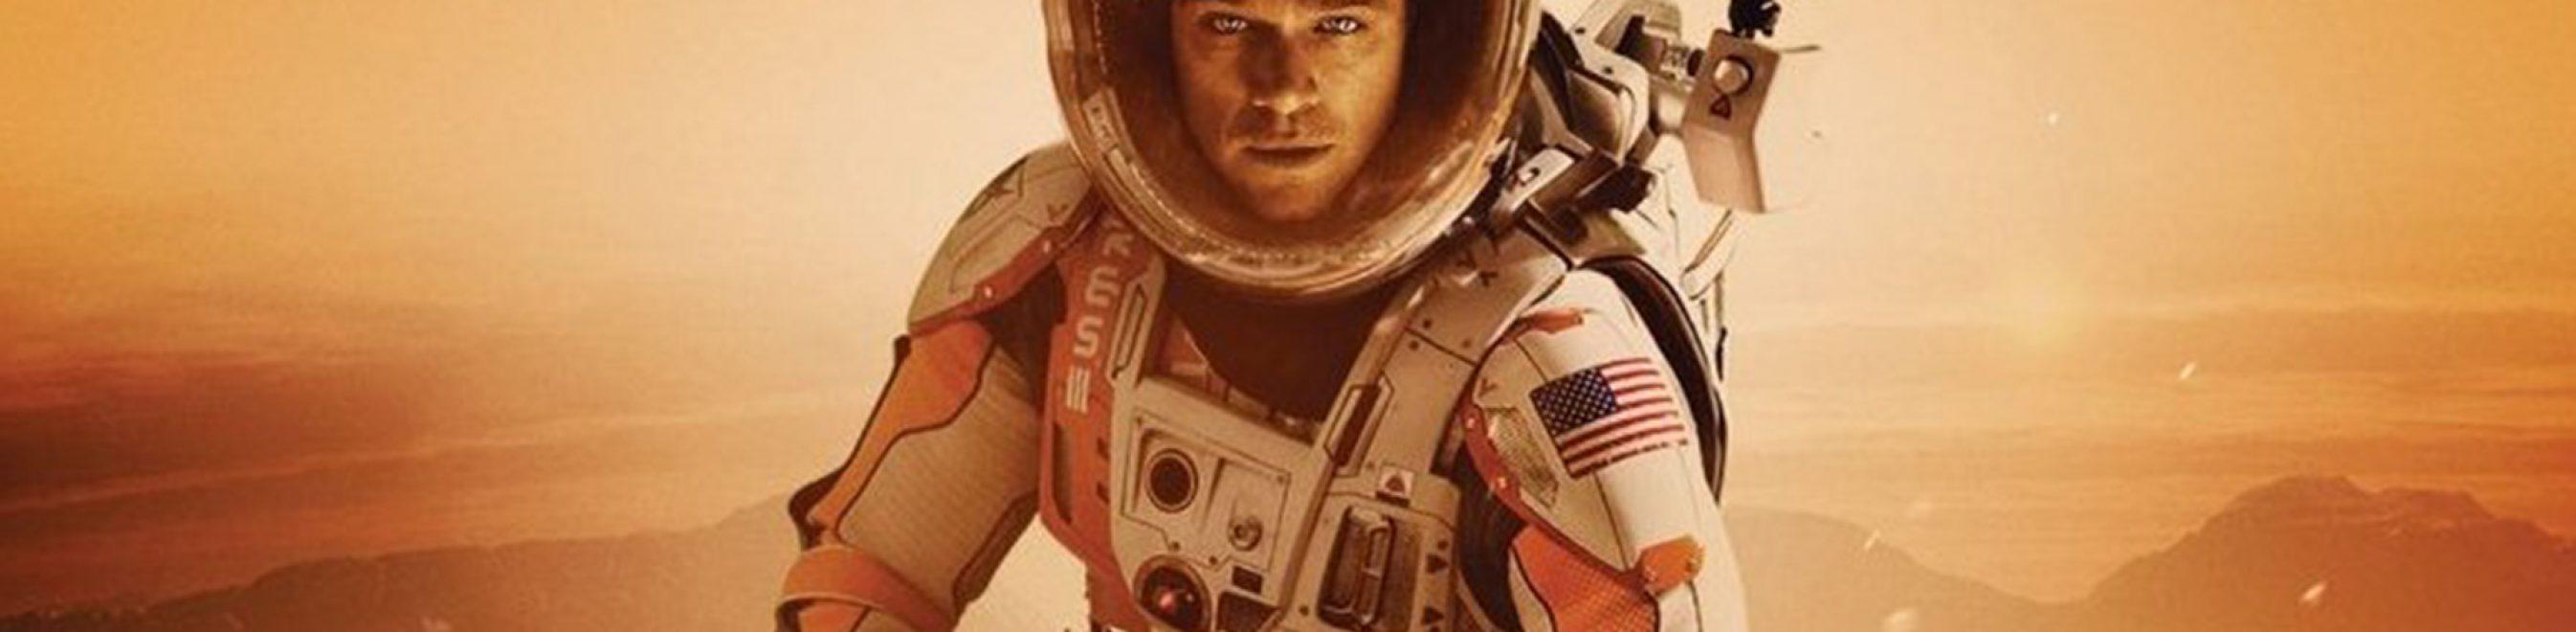 Sopravvissuto - The Martian